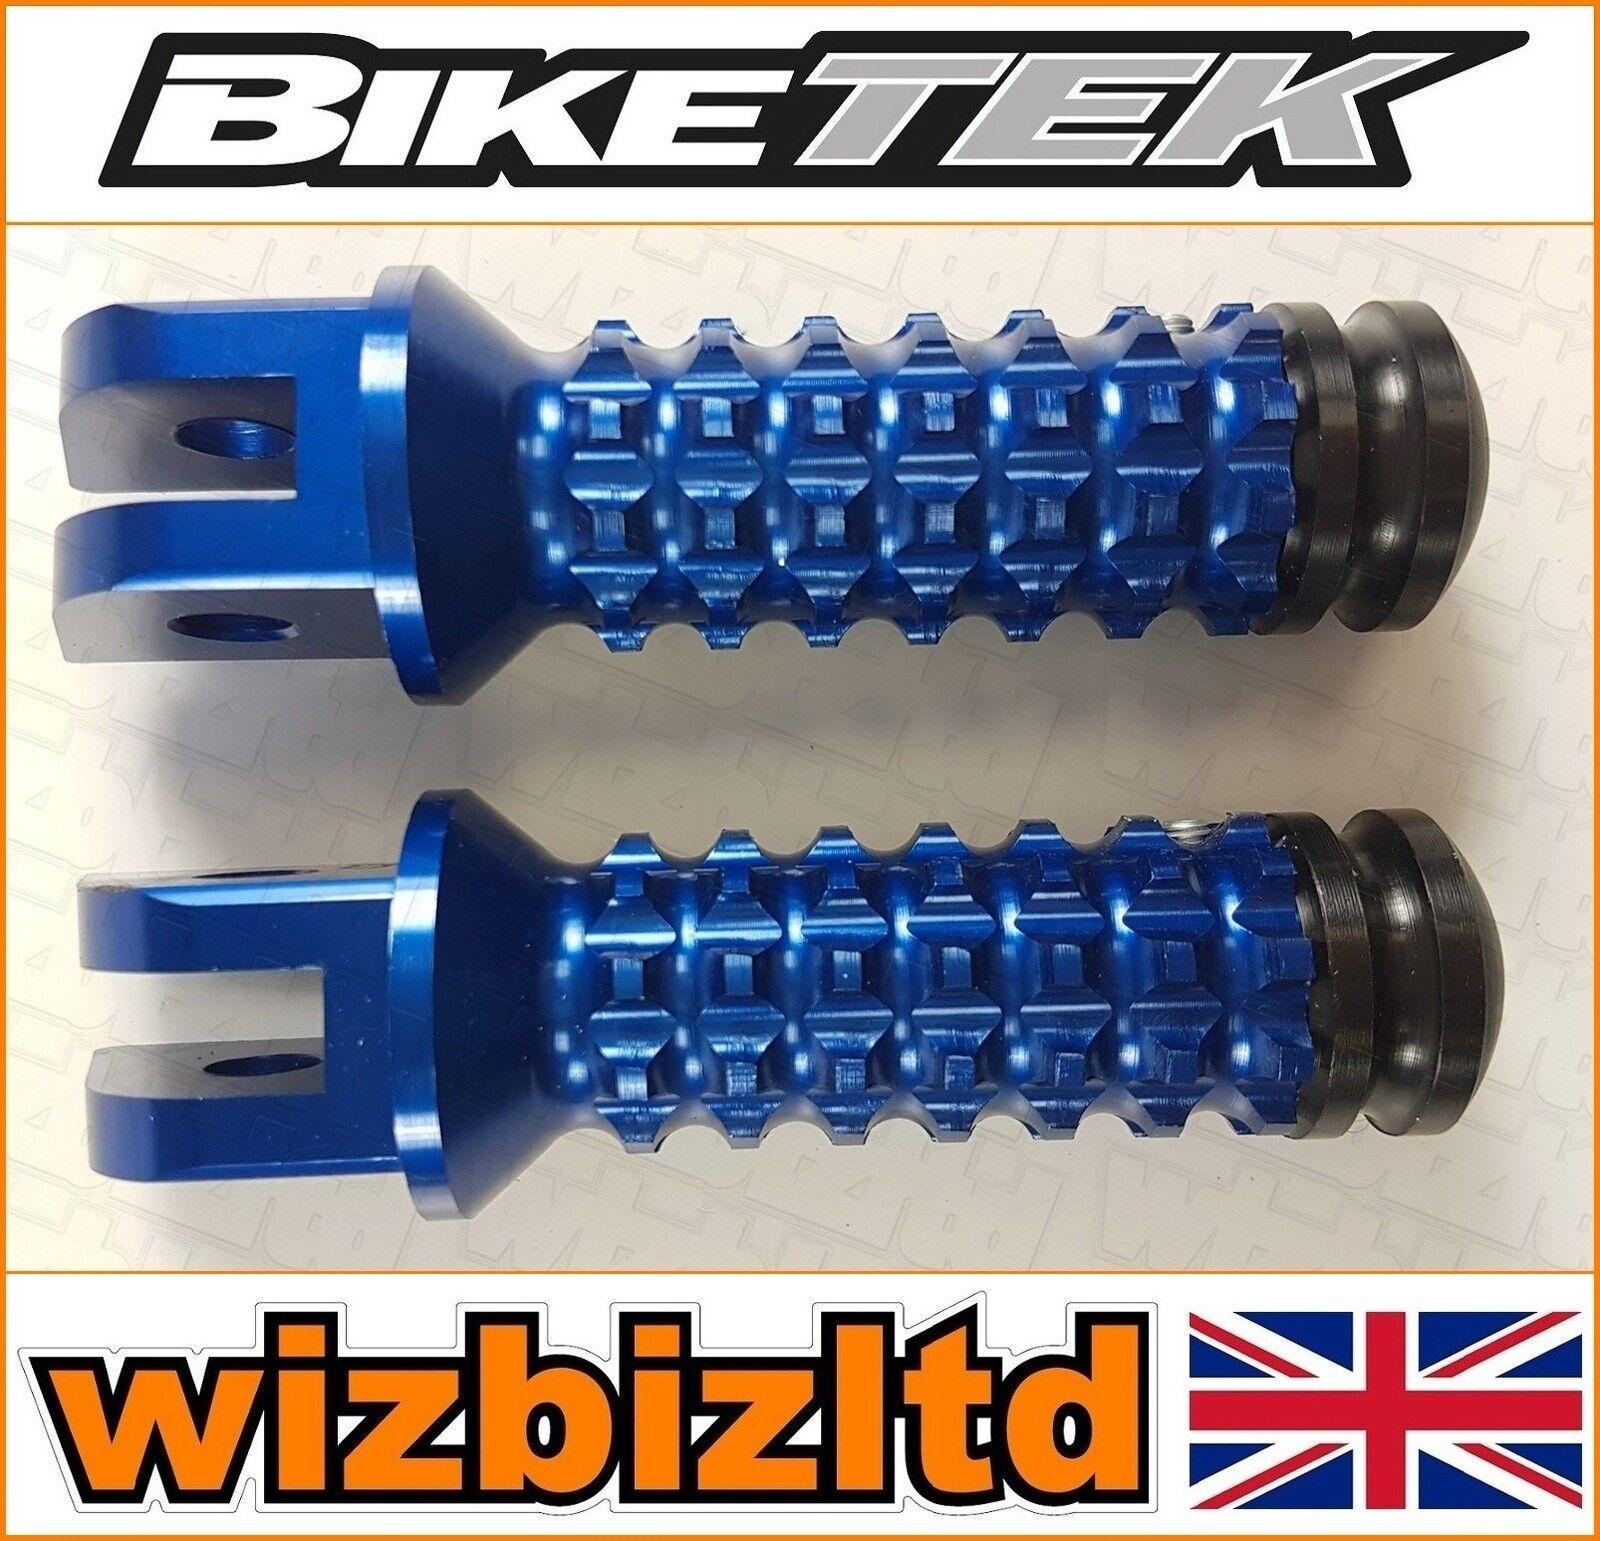 Biketek bluee Premium CNC Vorne Fußrasten Yamaha YZF-R1 1998-2012  FPGYF11BU  novelty items